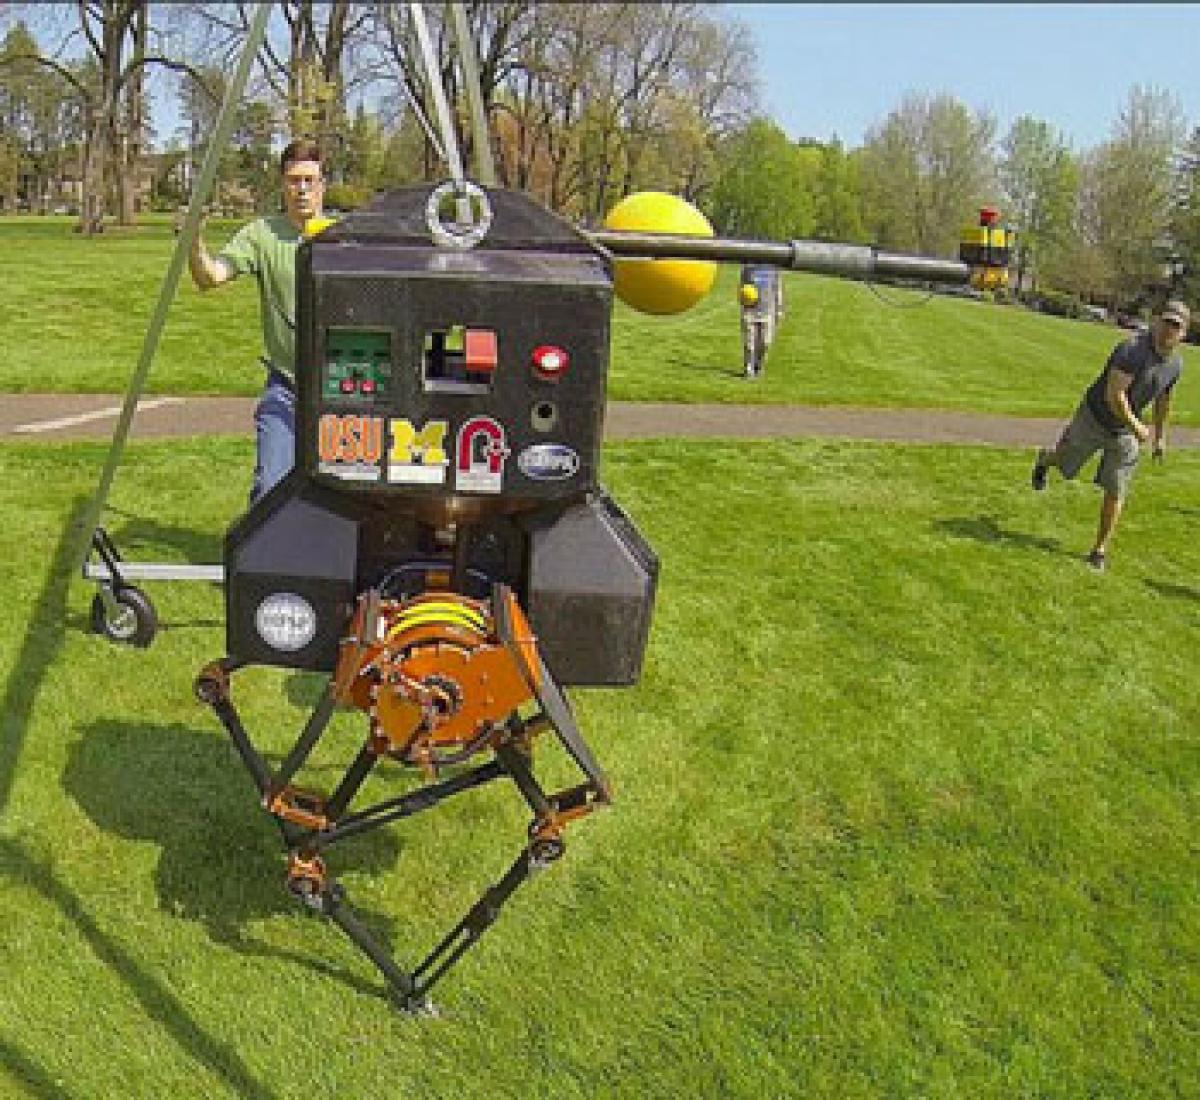 New technology can make robots walk and run like humans